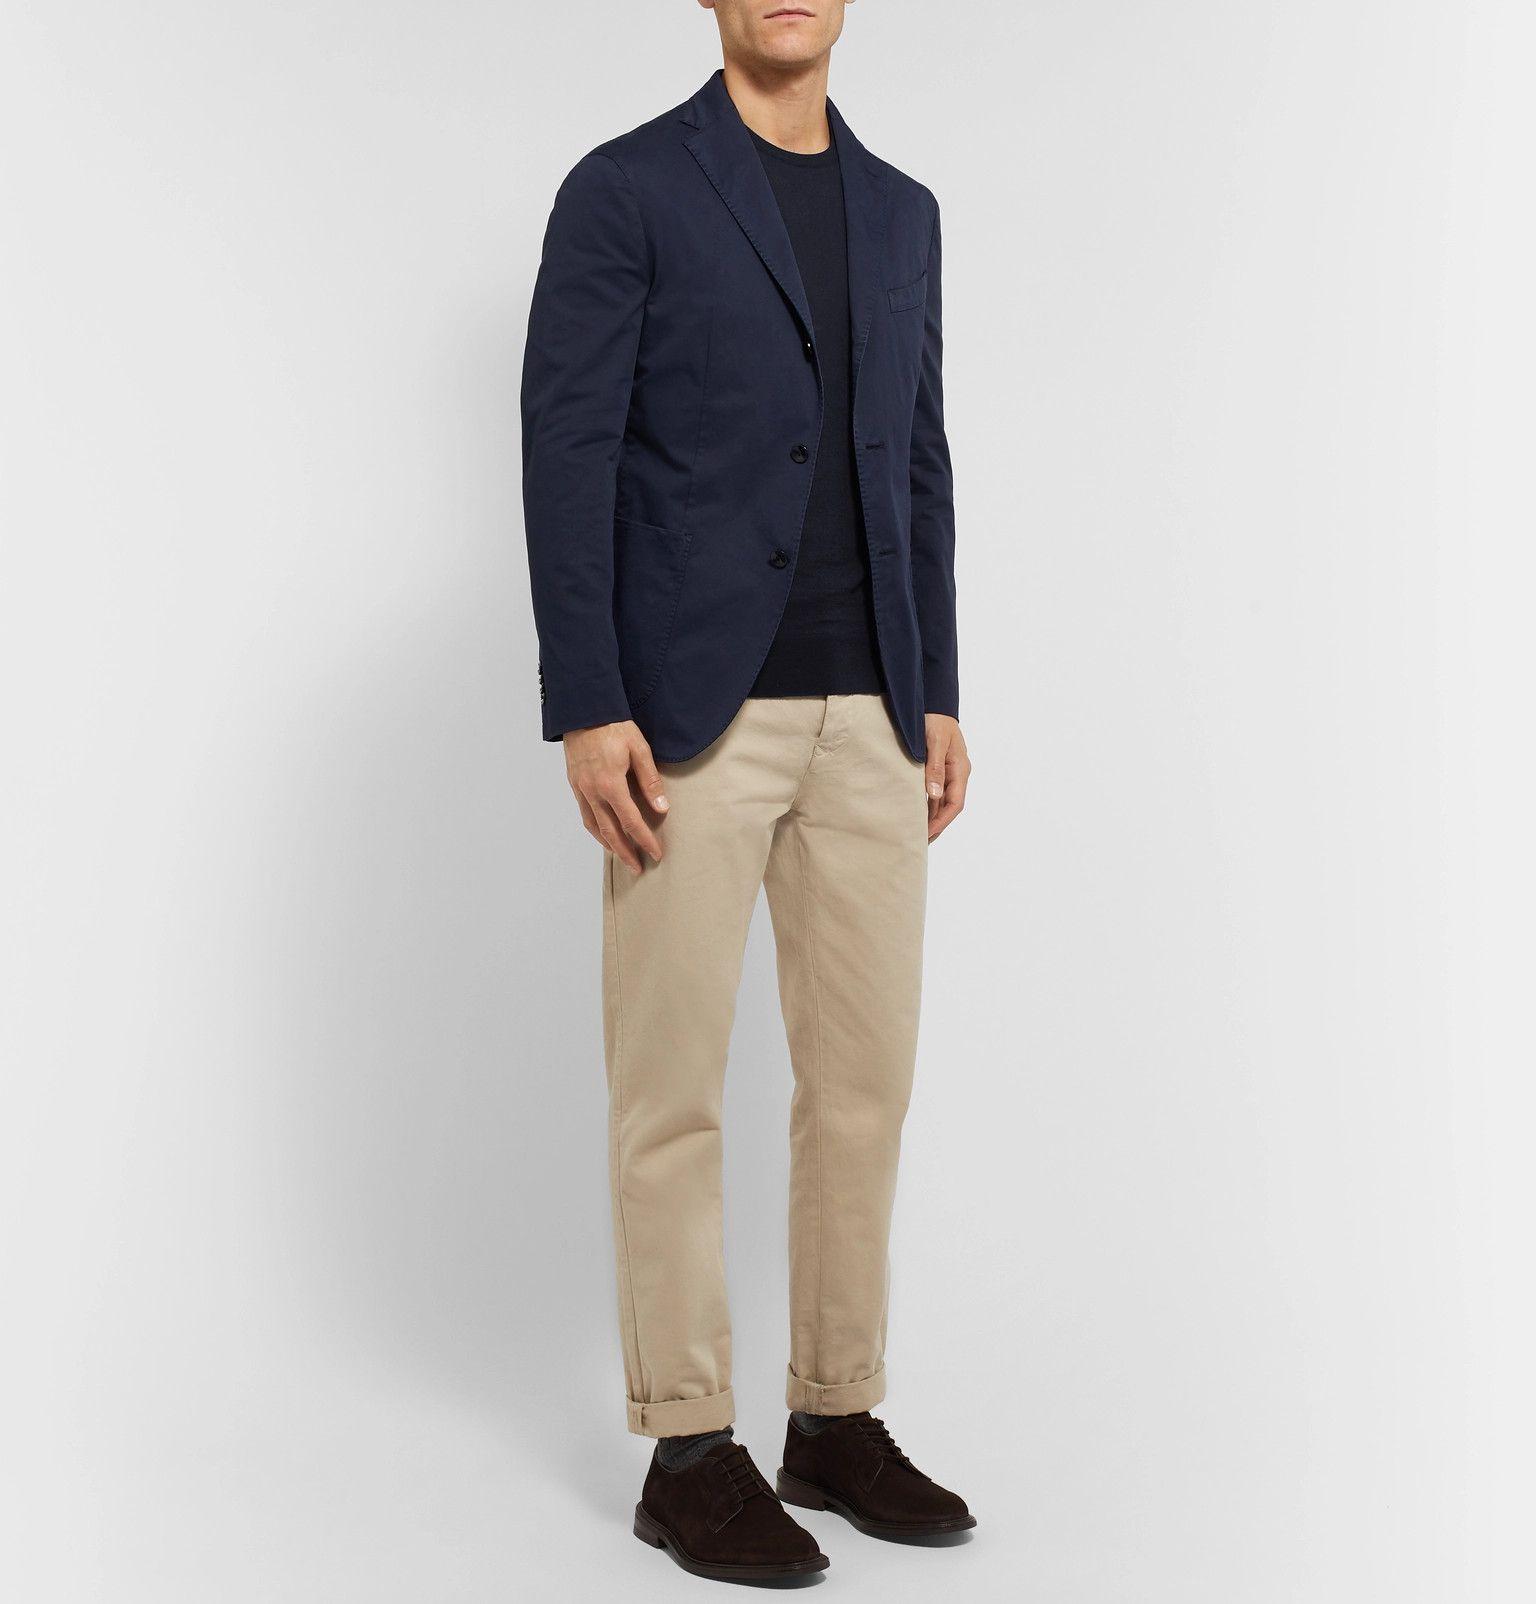 Joe Wenko Mens V Neck Pullover Fall//Winter Waistcoat Casual Knitted Vest